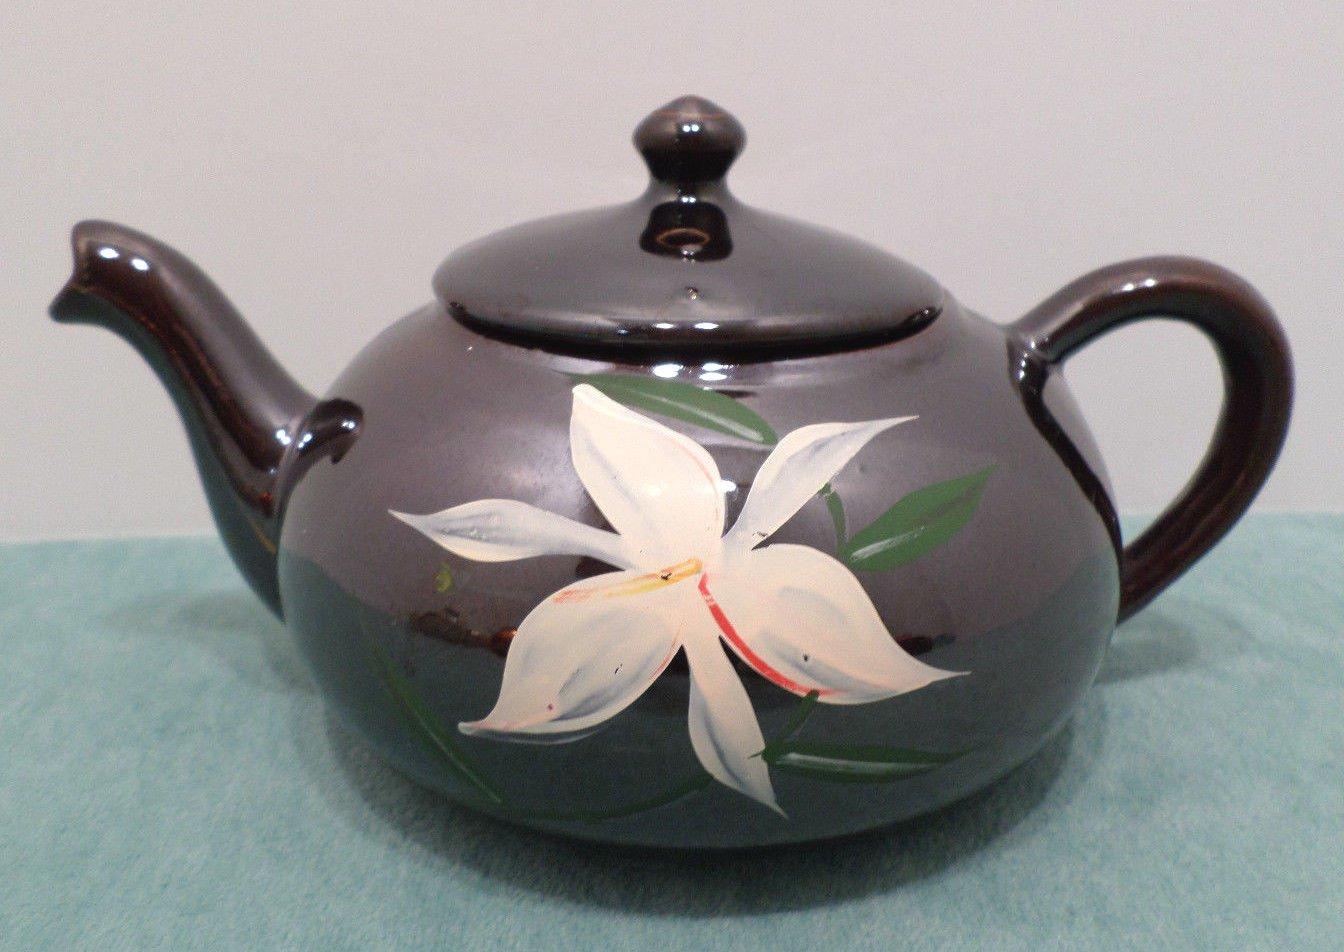 Vintage Tea Pot Brown Glaze Pottery with a White Flower